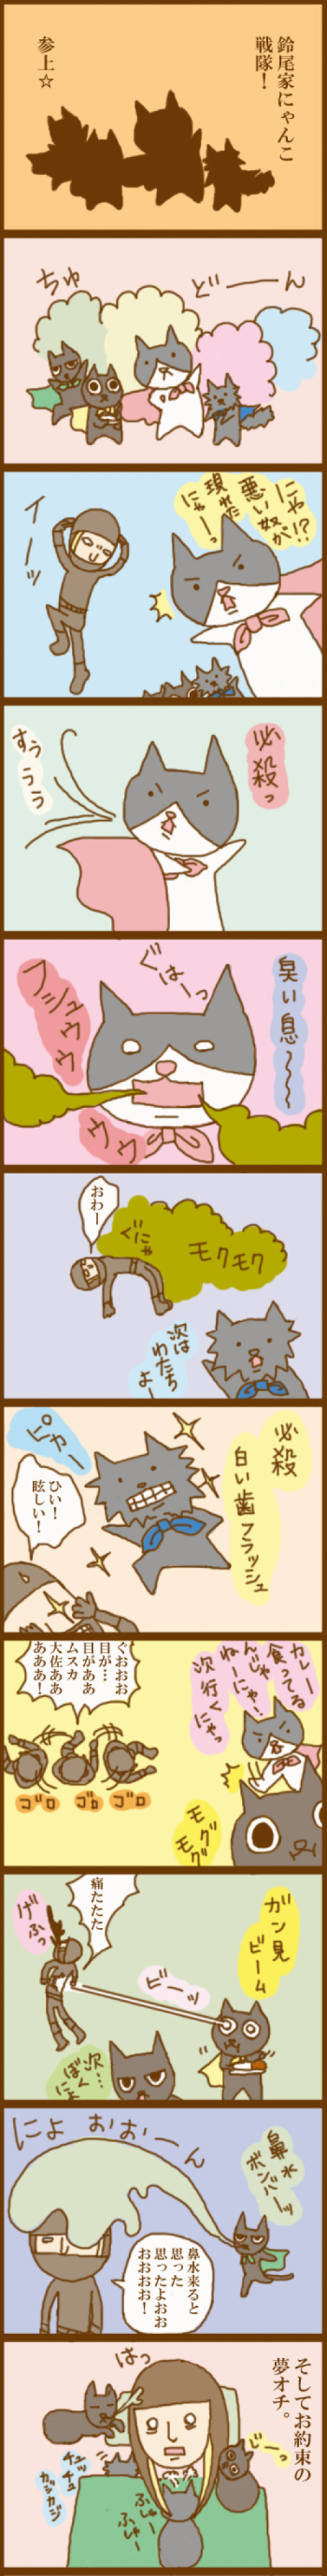 f:id:suzuokayu:20201109091743j:plain